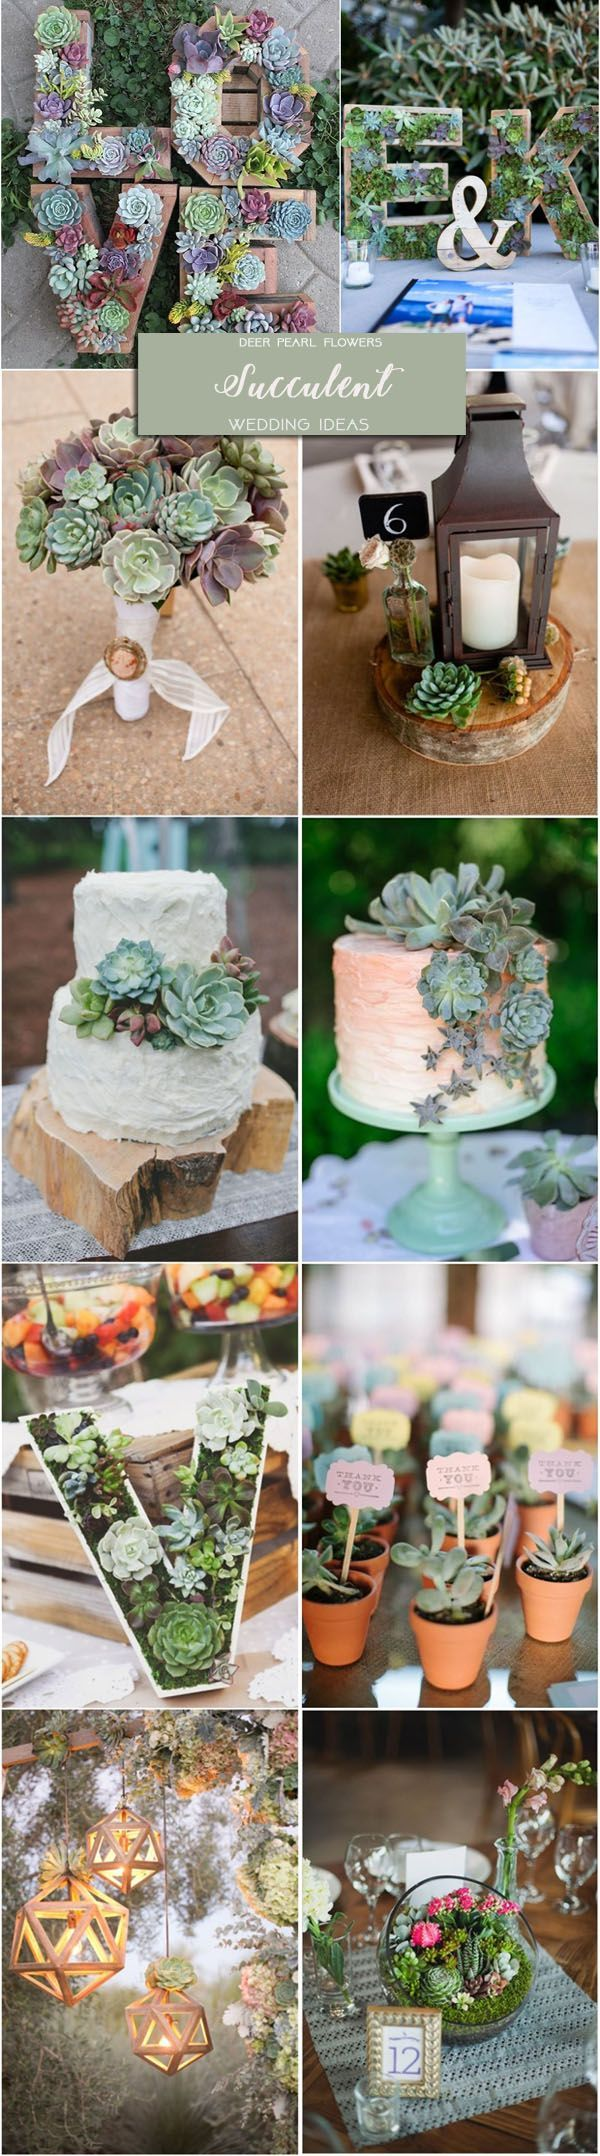 Rustic green garden wedding ideas - succulent wedding theme decor ideas / http://www.deerpearlflowers.com/rustic-wedding-themes-ideas-part-2/2/